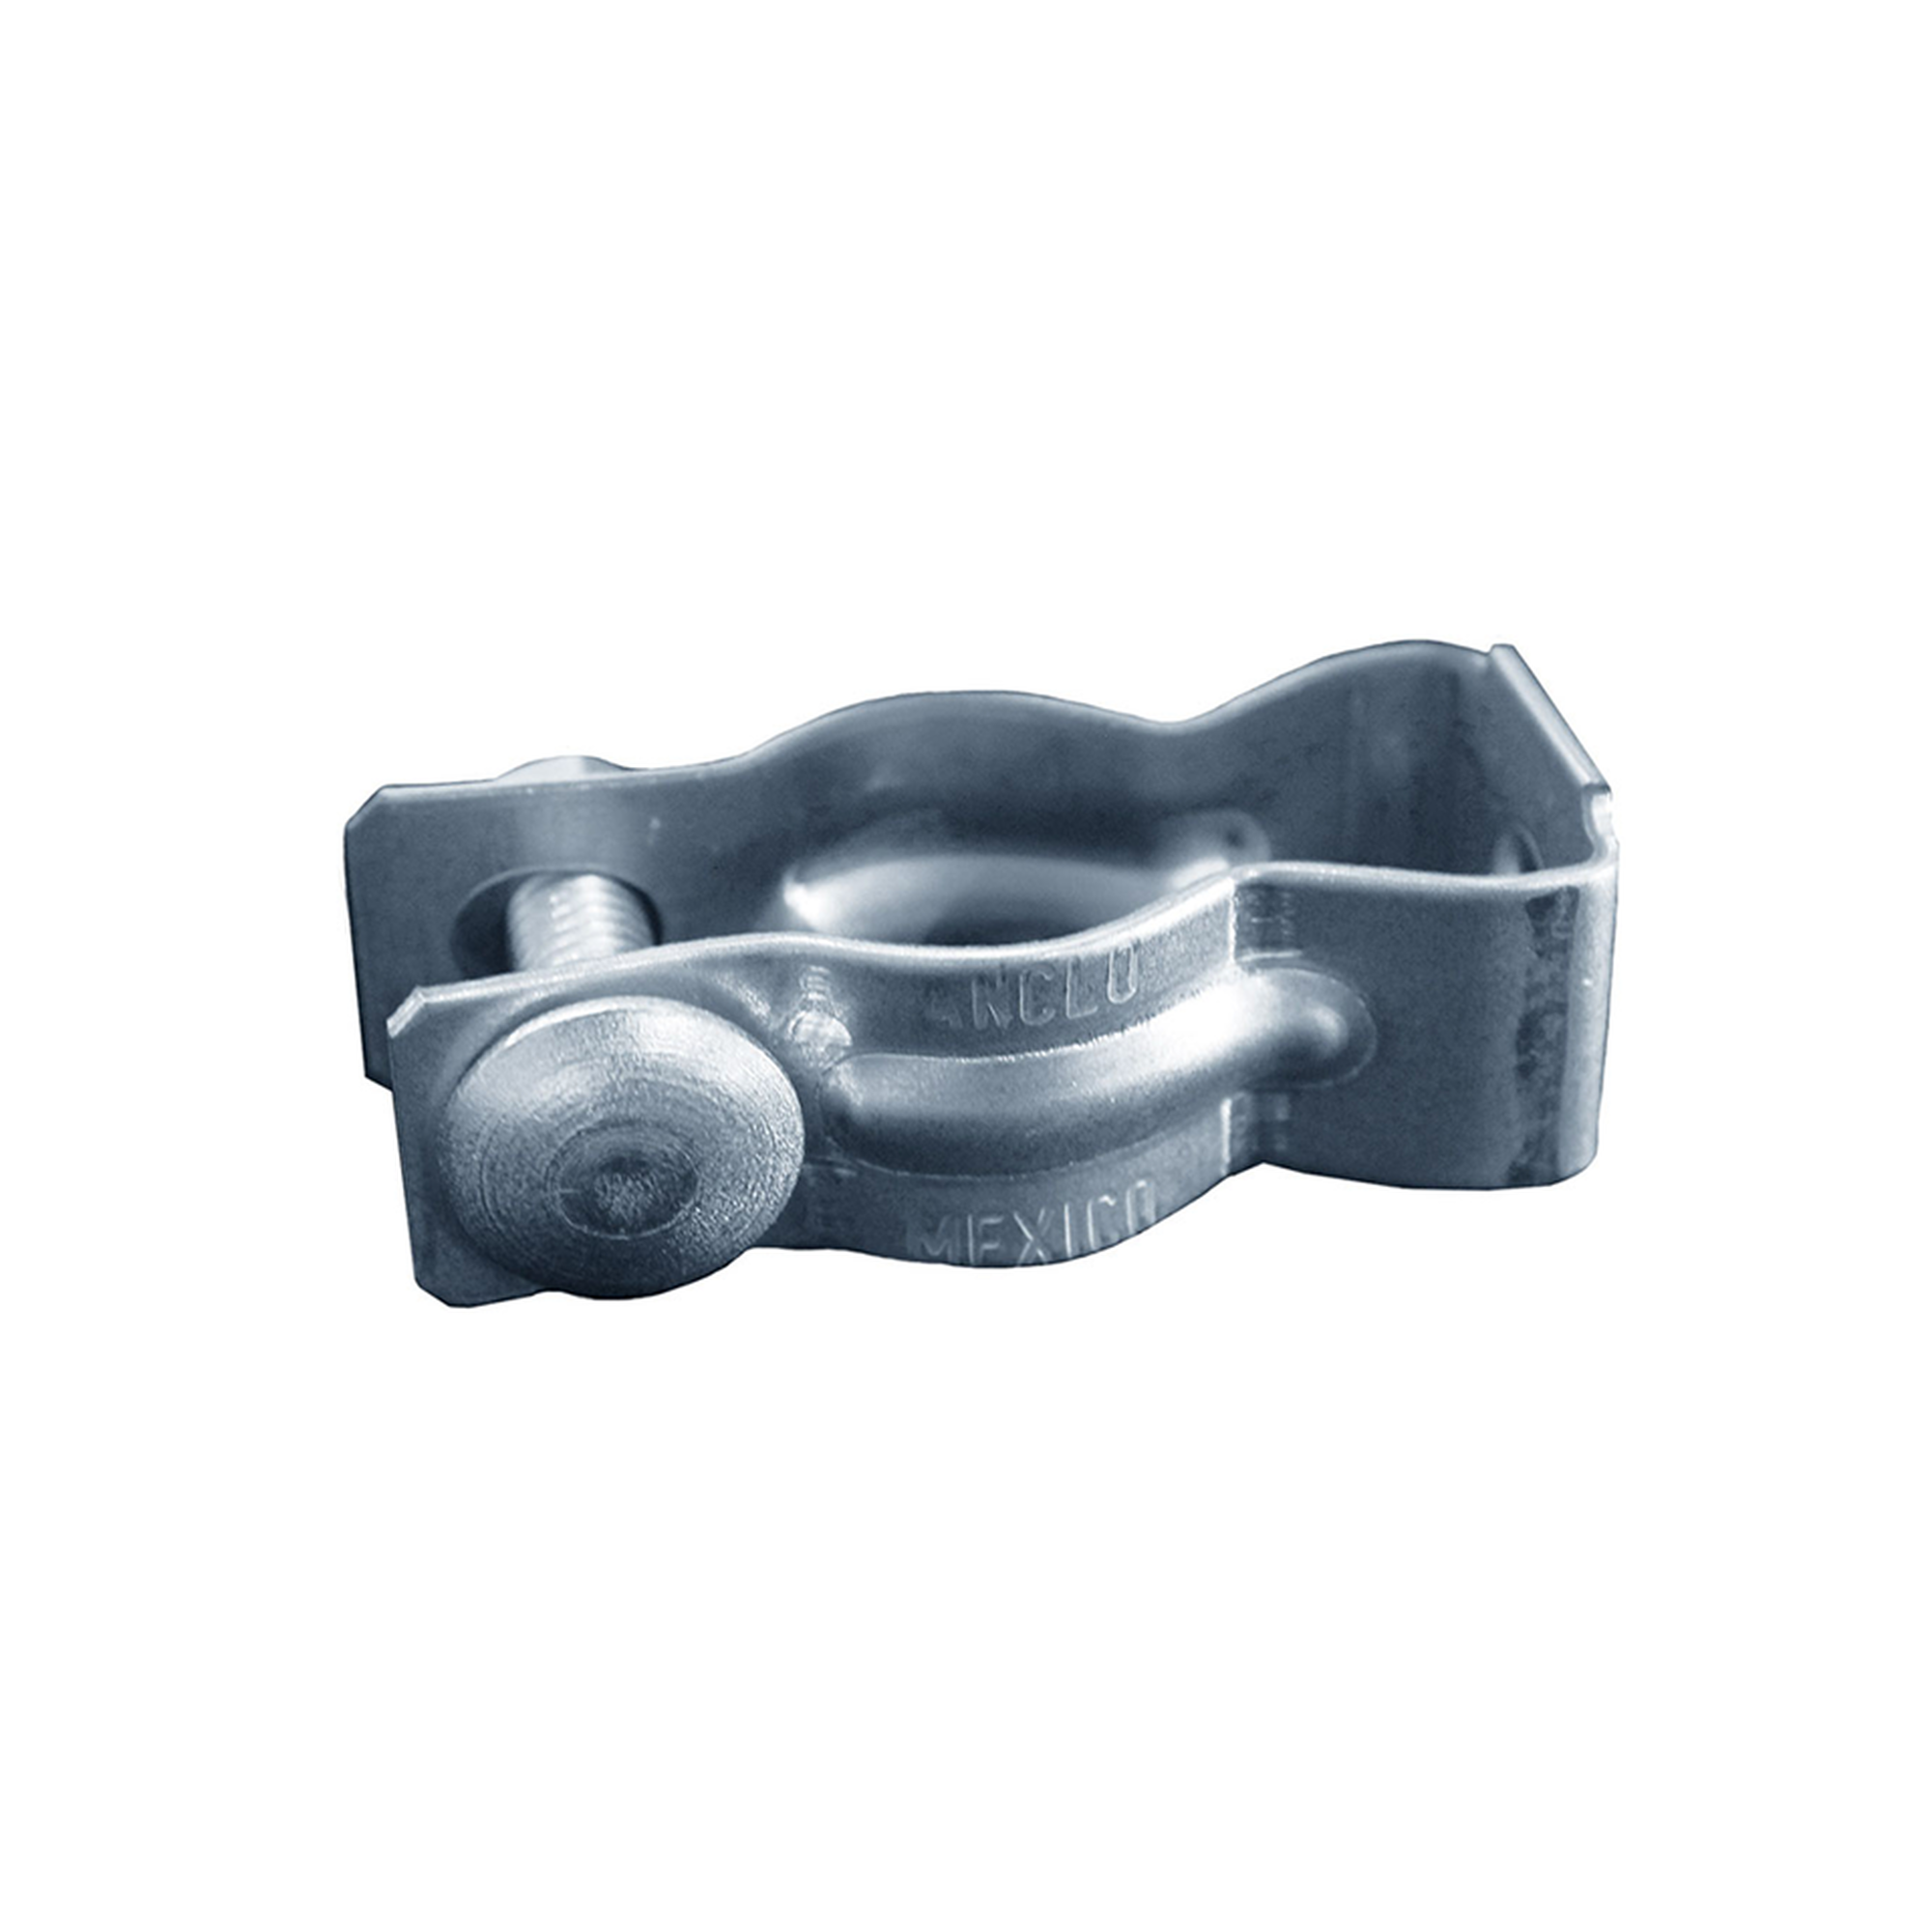 Clip para Tubería Conduit de 3/4 (19 mm).